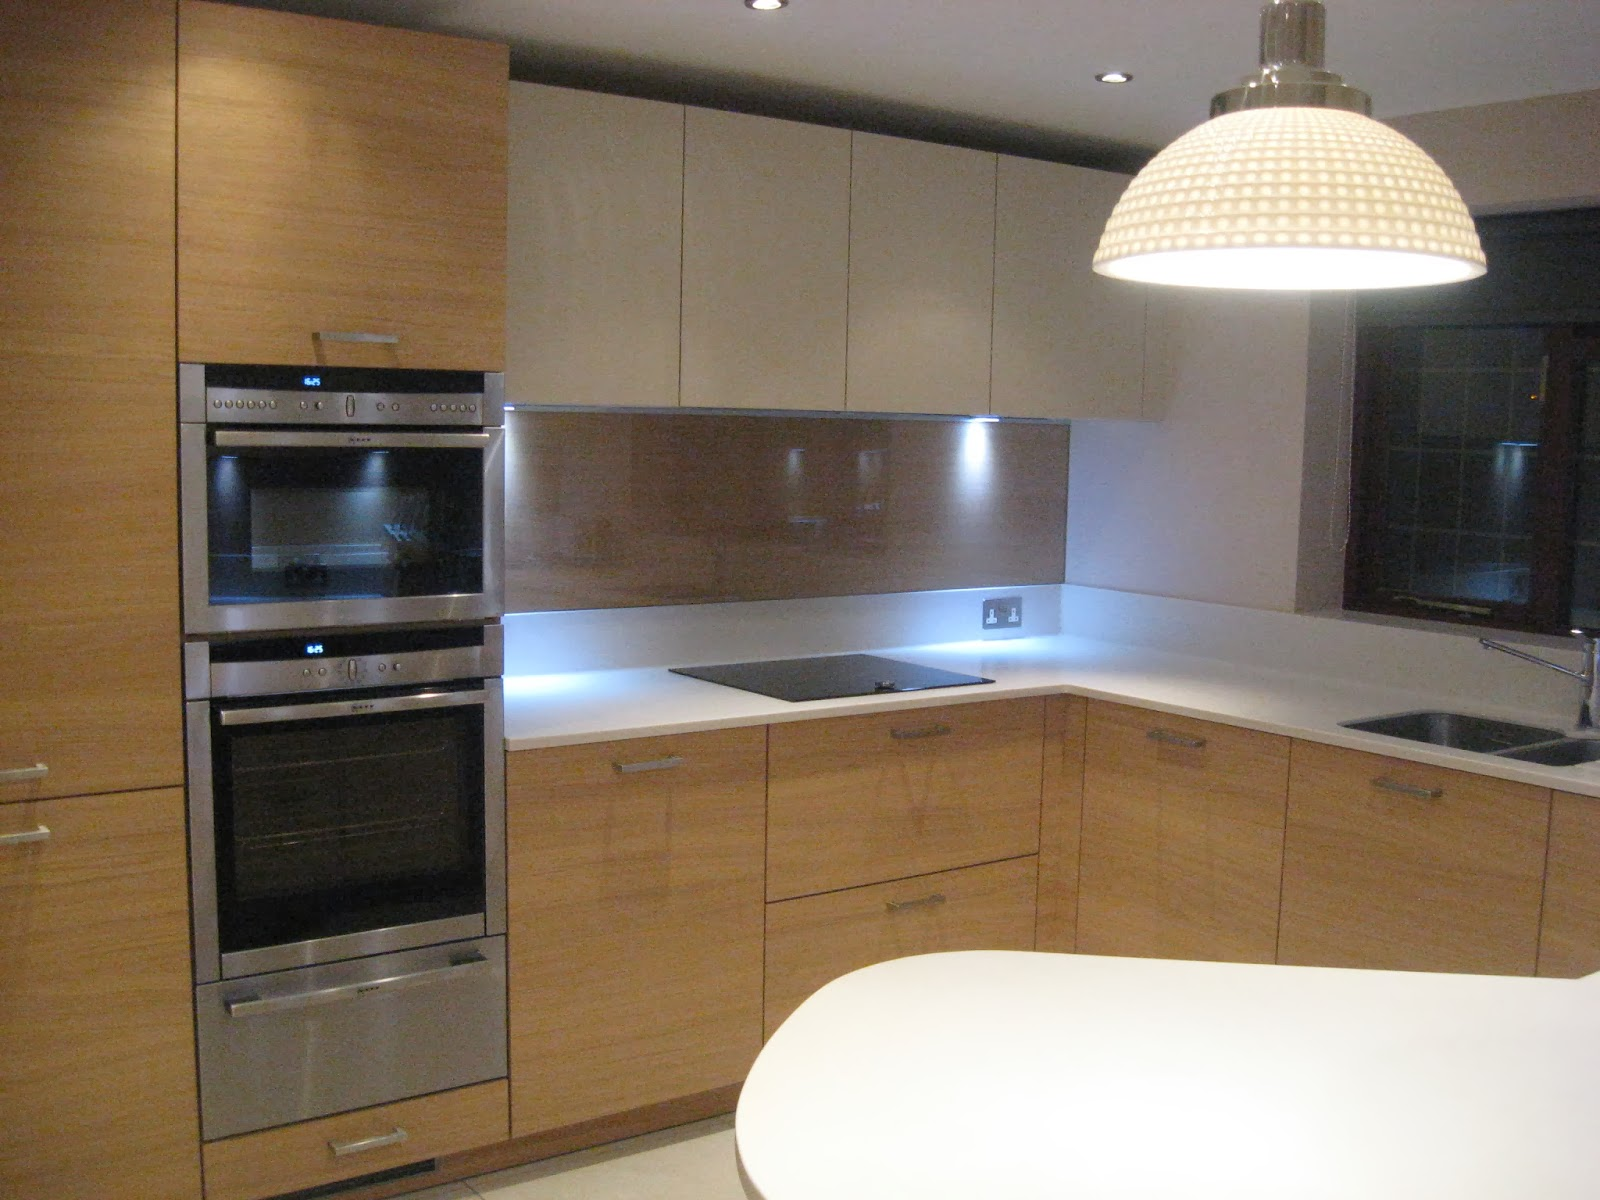 David Jones Kitchen Appliances Diane Berry Kitchens Client Kitchens January 2014